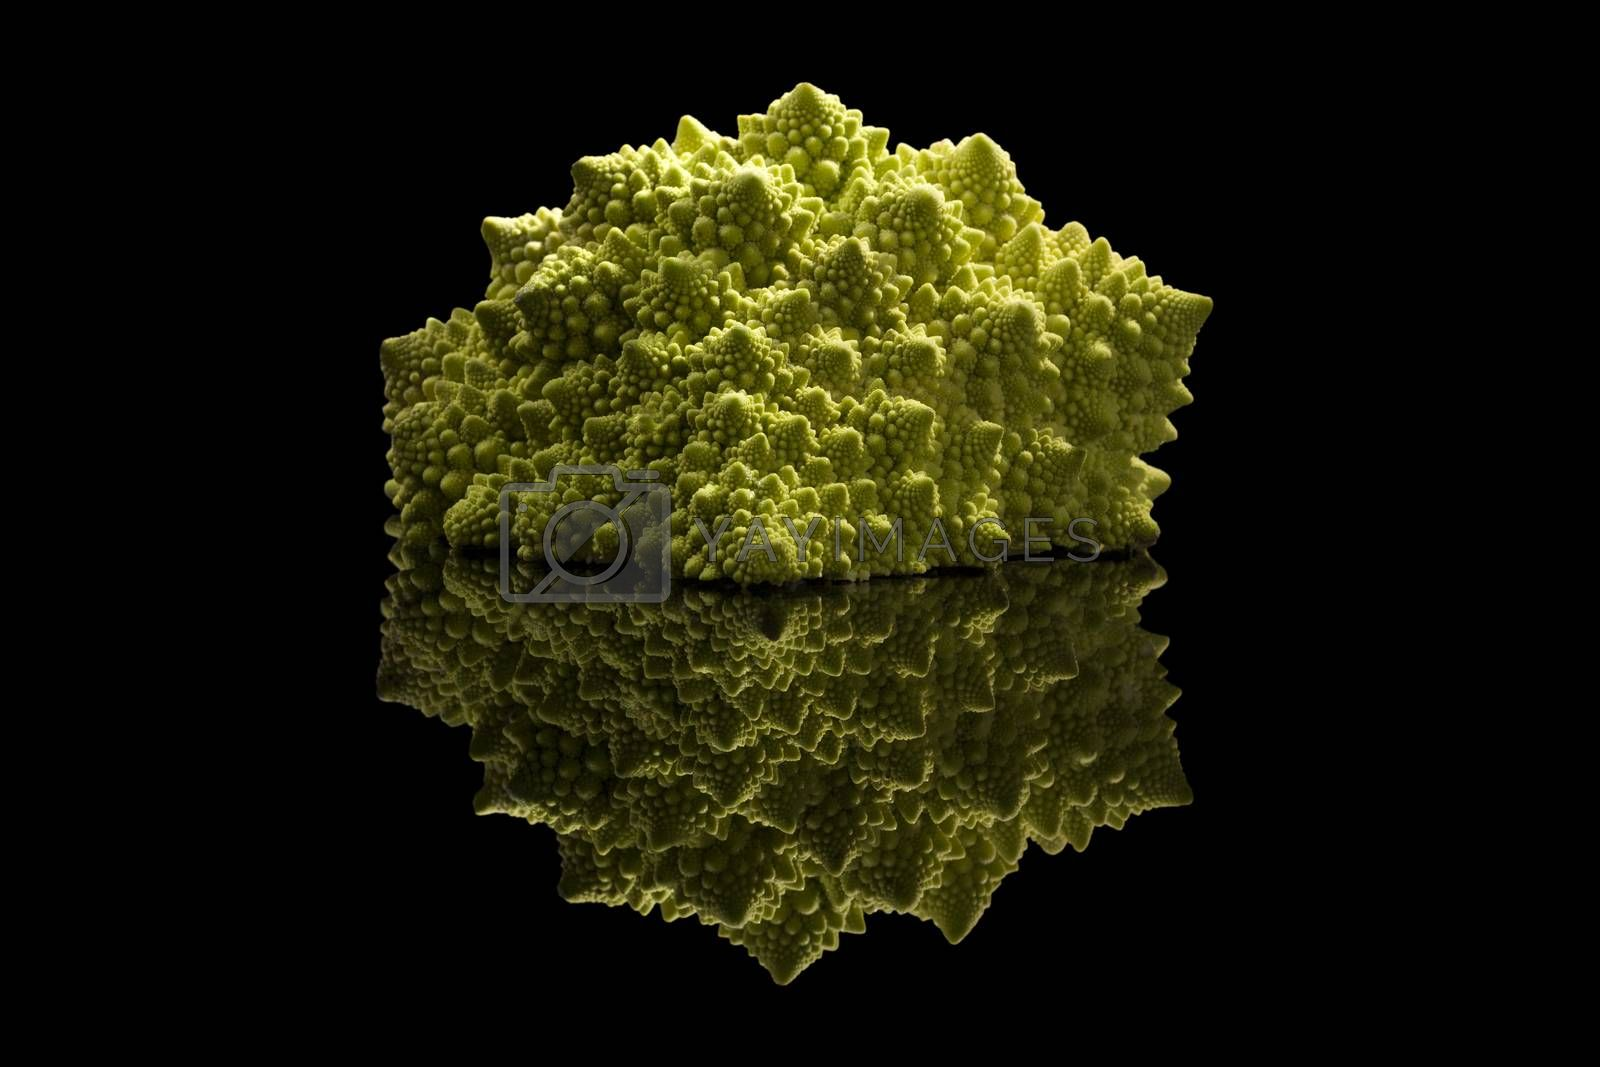 Romanesco broccoli isolated on black background with reflection. Fresh vegetable eating.